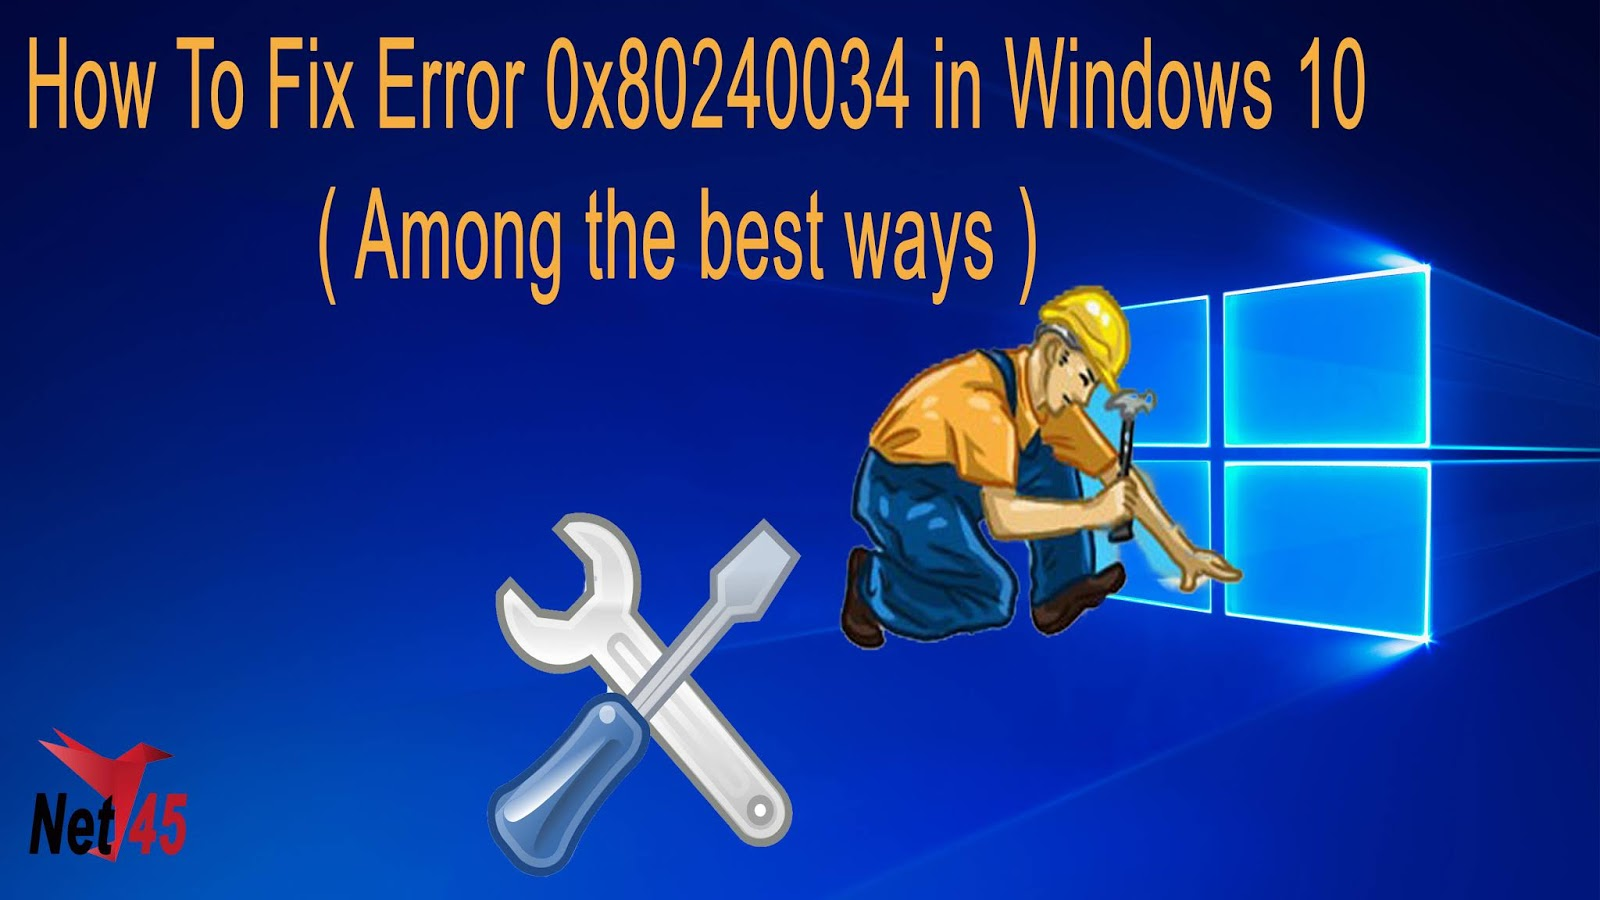 windows 10,windows update,how to fix all windows 10 update errors,how to fix windows error 0x8007007a,how to fix windows 10 update 1903 failed to install!,windows 7,fix window update in windows 10,fix windows 10 update 1903 failed to install,error when upgrading to windows 10,windows,how to fix,how to fix windows update 1803,0x80071a90 in windows 10,how to update windows 10